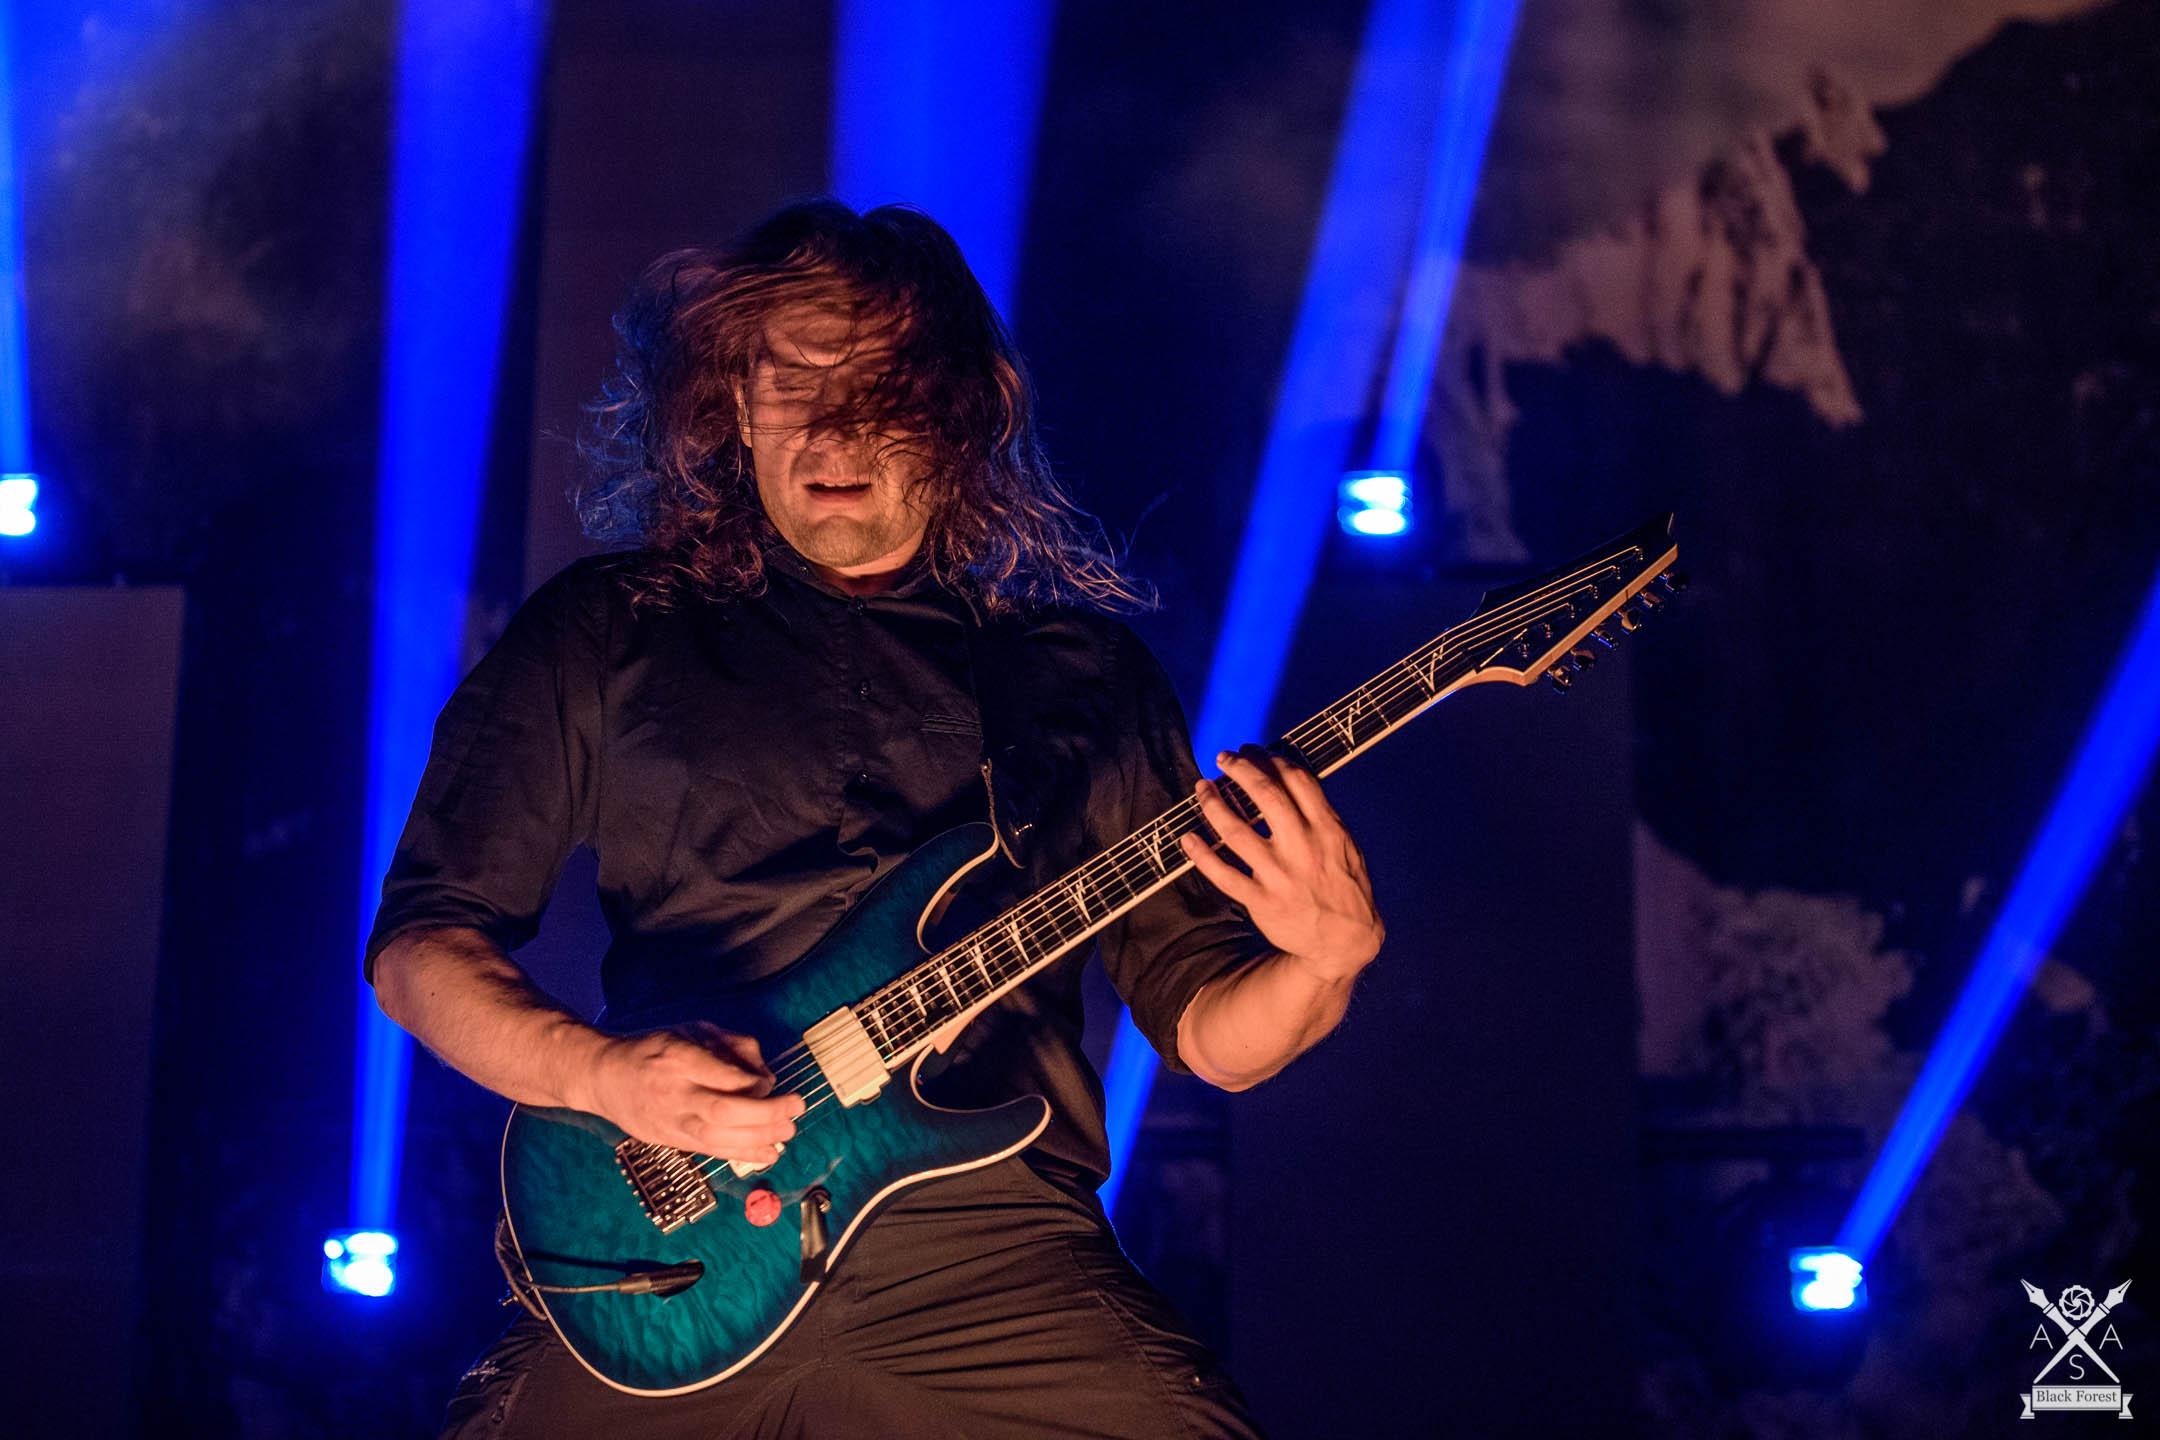 Korn - Heaven Shall Burn - Hell Yeah